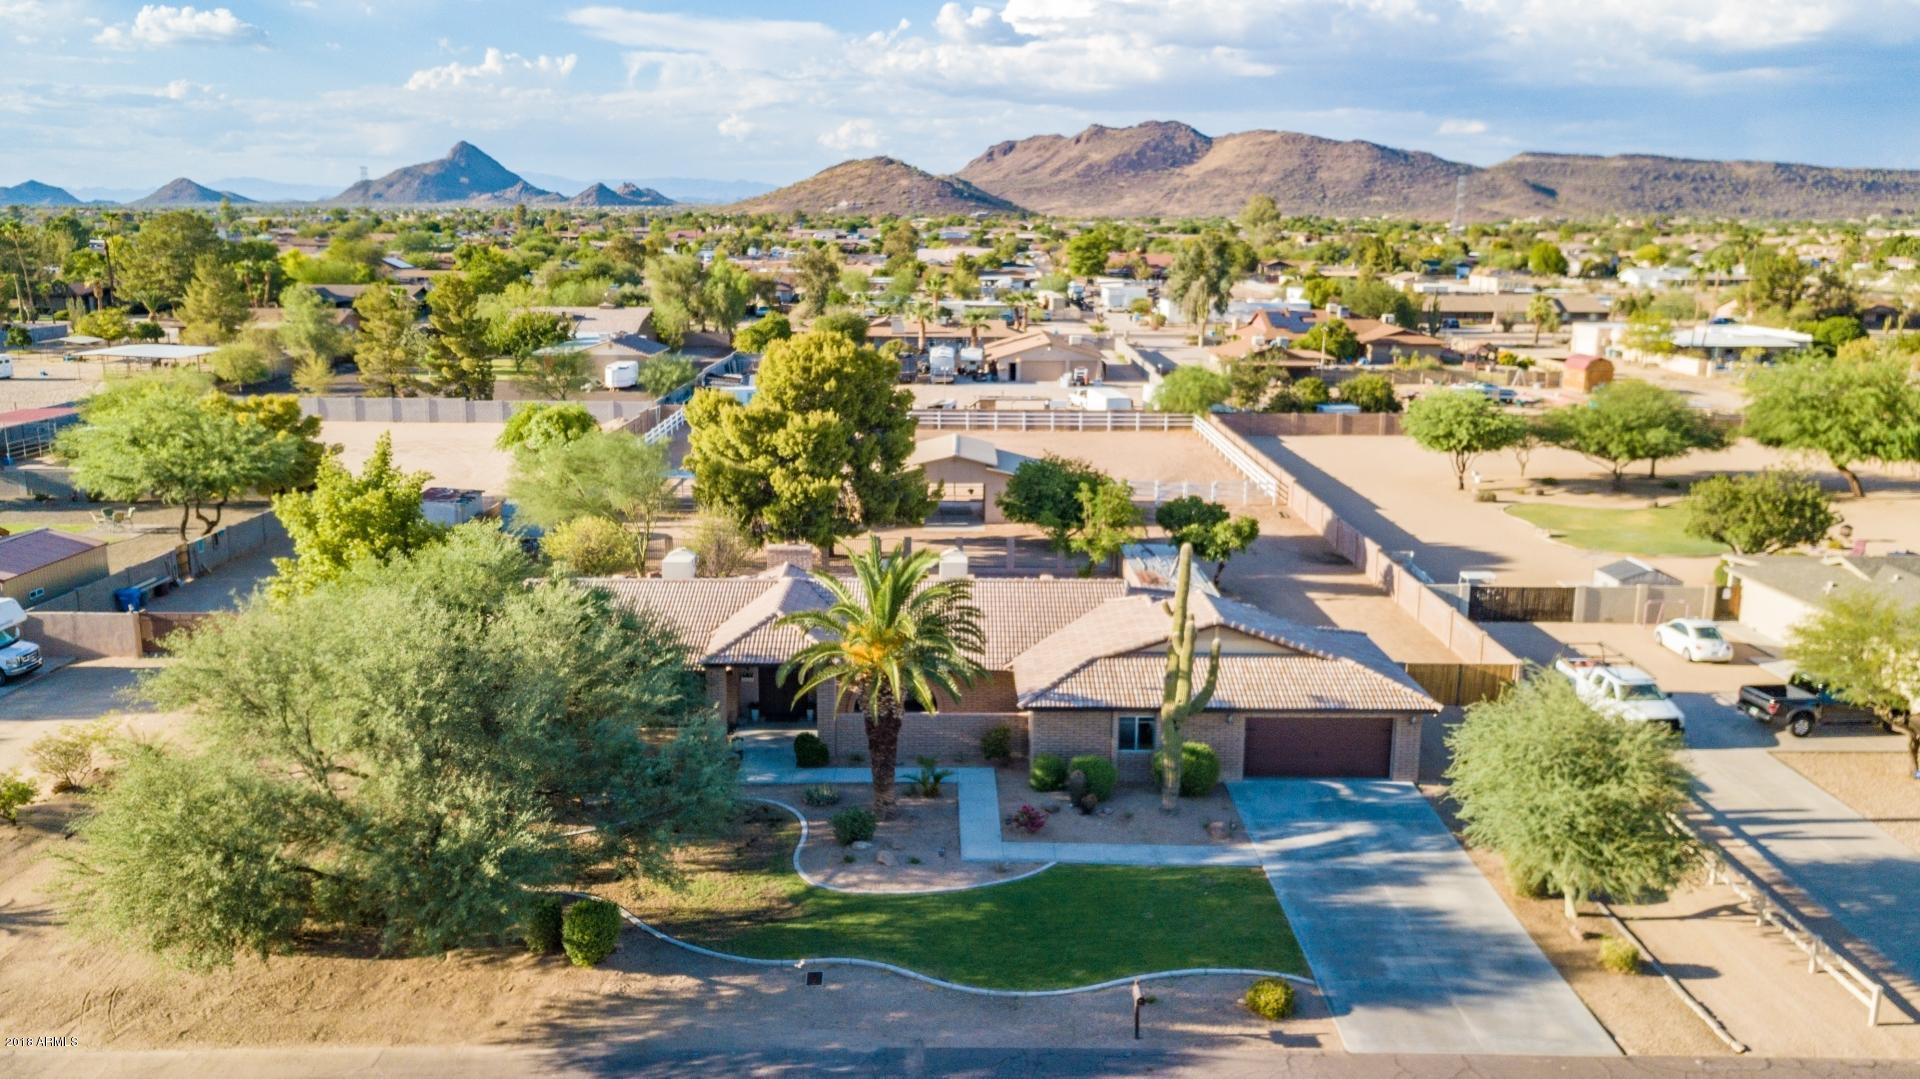 Photo of 4802 W Soft Wind Drive, Glendale, AZ 85310